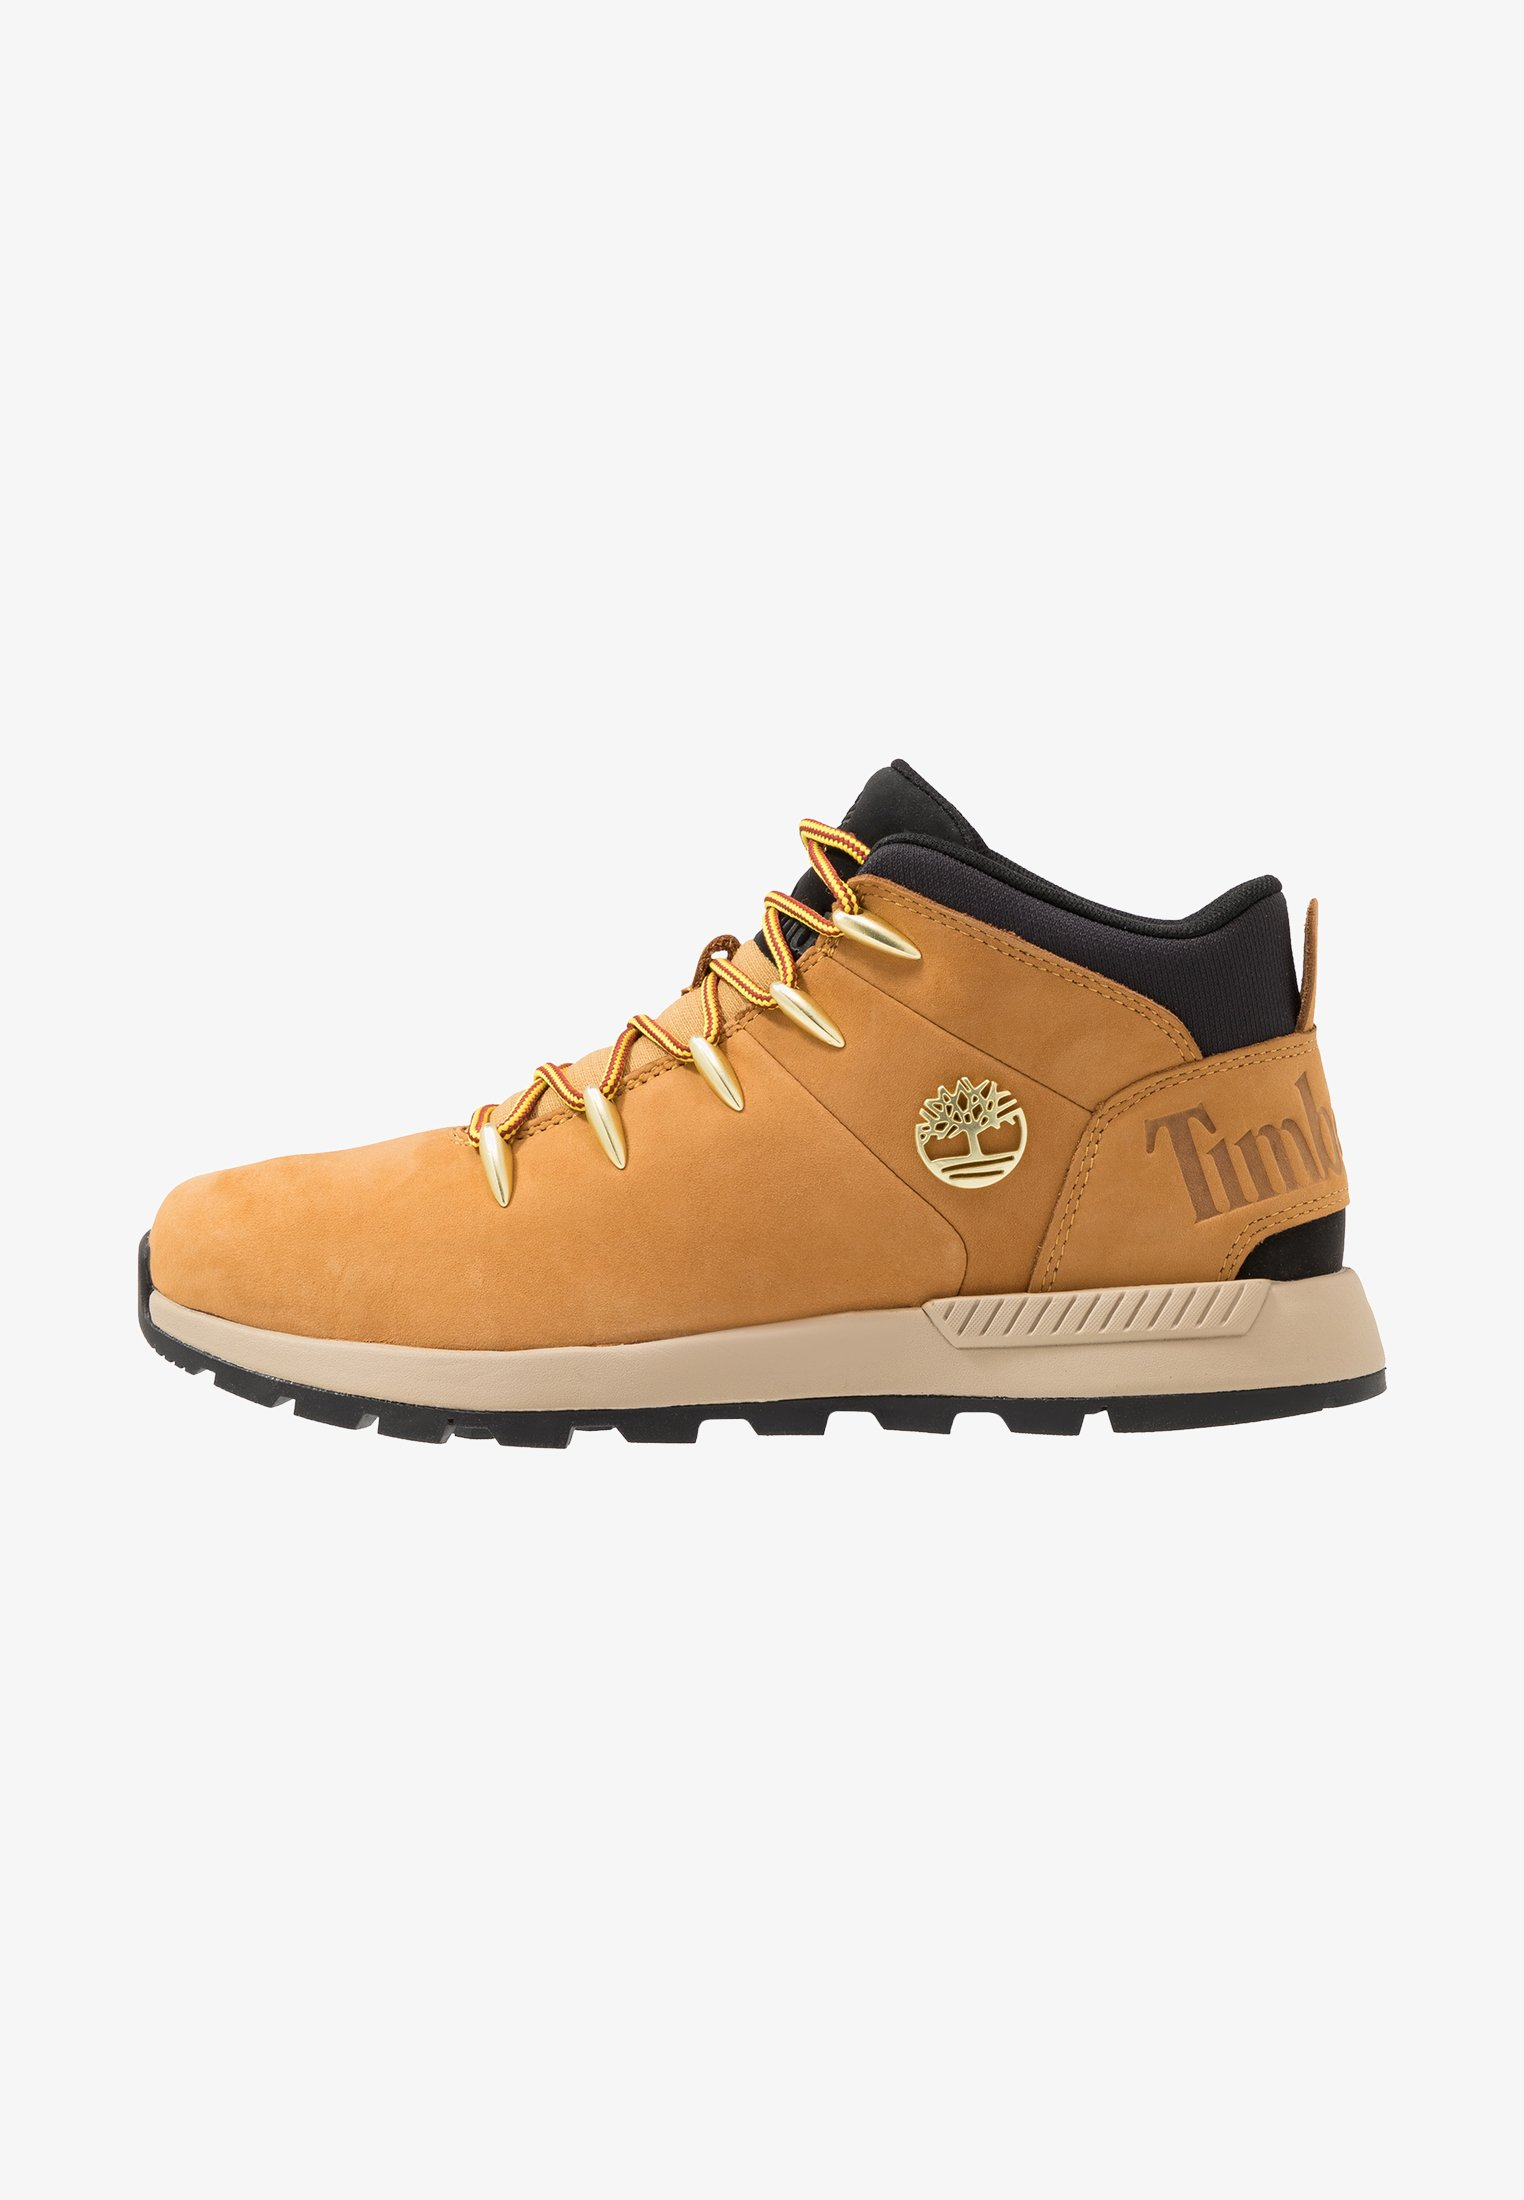 Alergia desconcertado Resaltar  Timberland SPRINT TREKKER MID - Lace-up ankle boots - wheat/camel - Zalando .ie